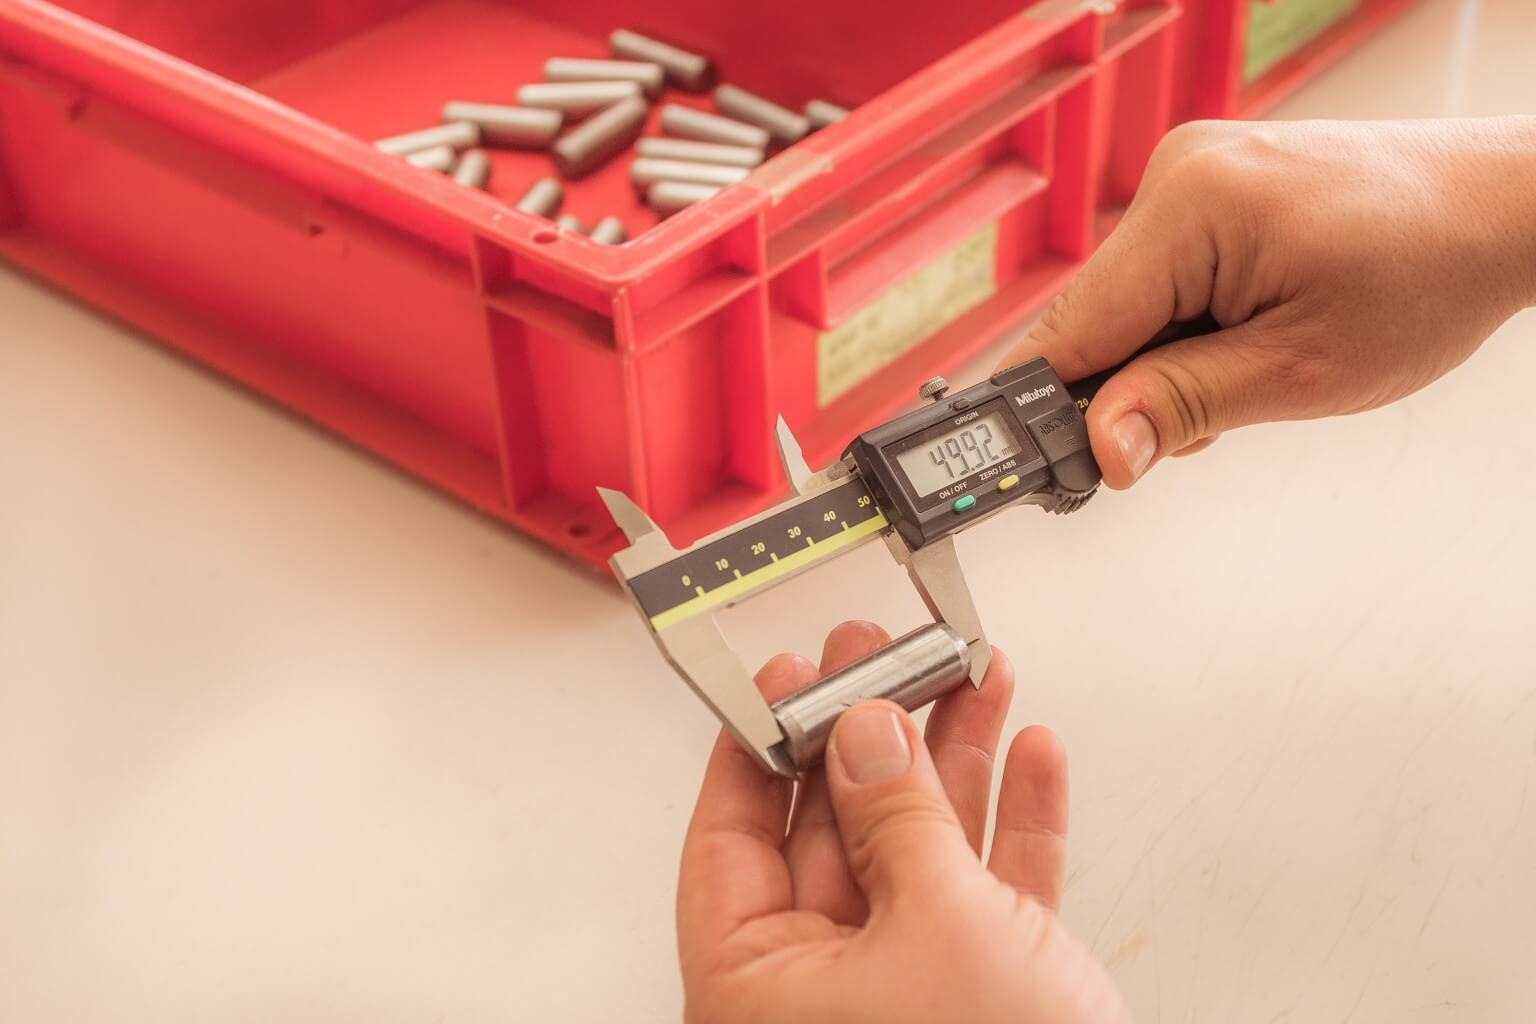 Measurement Tool sichtpruefung csl2 control rework montage elektromontage esd mikroskoppruefung